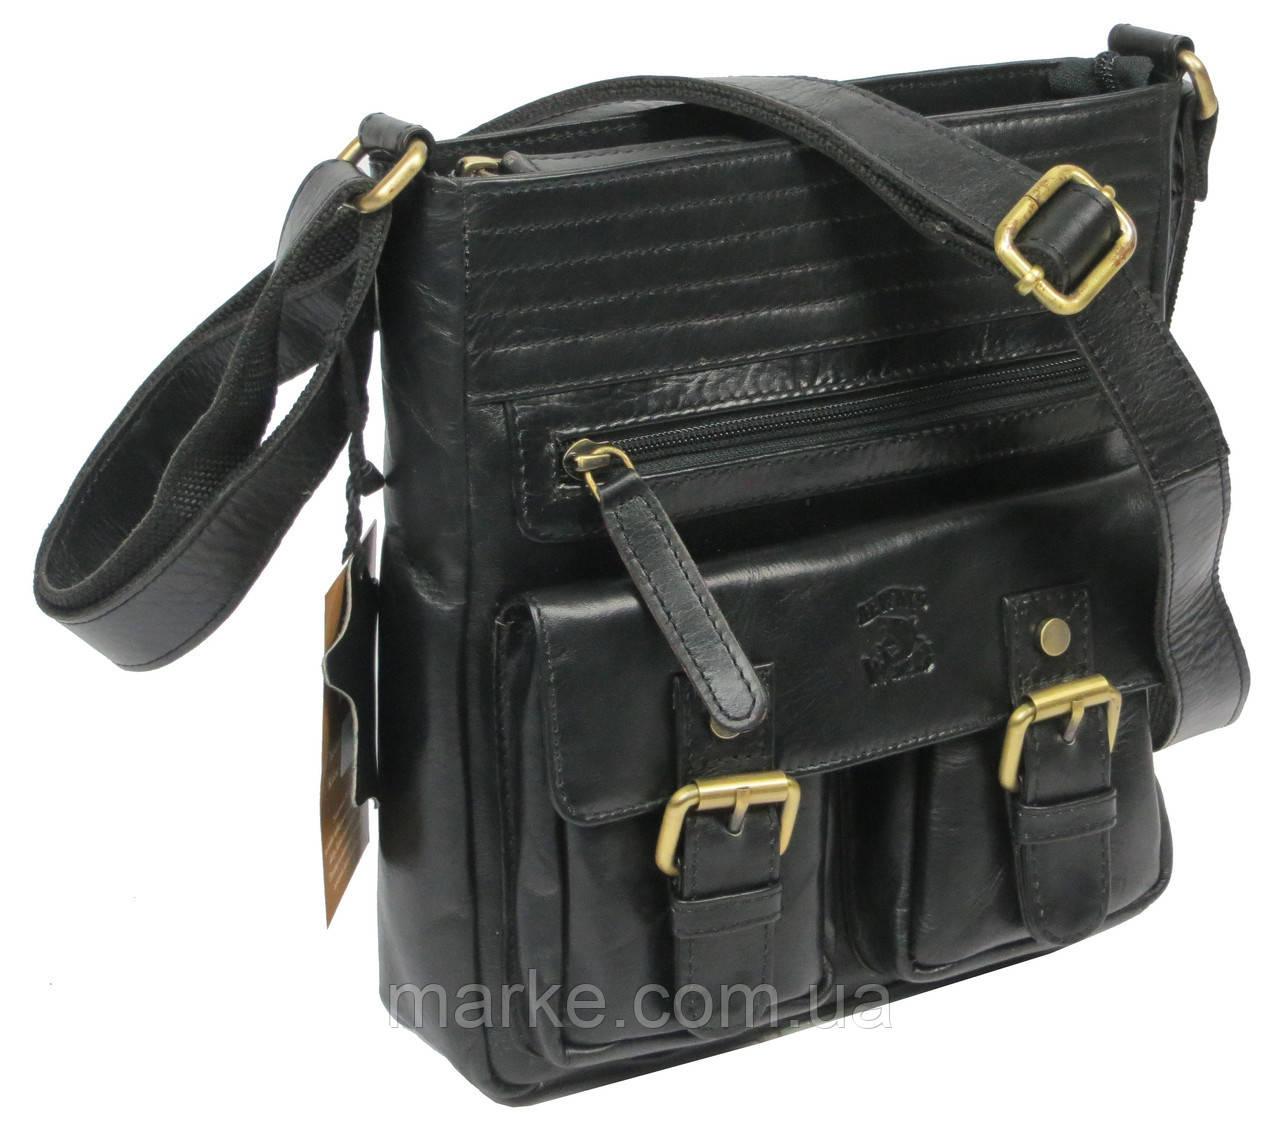 5055b82ff3e5 Мужская кожаная сумка Always Wild C48.0525 черная: продажа, цена в ...